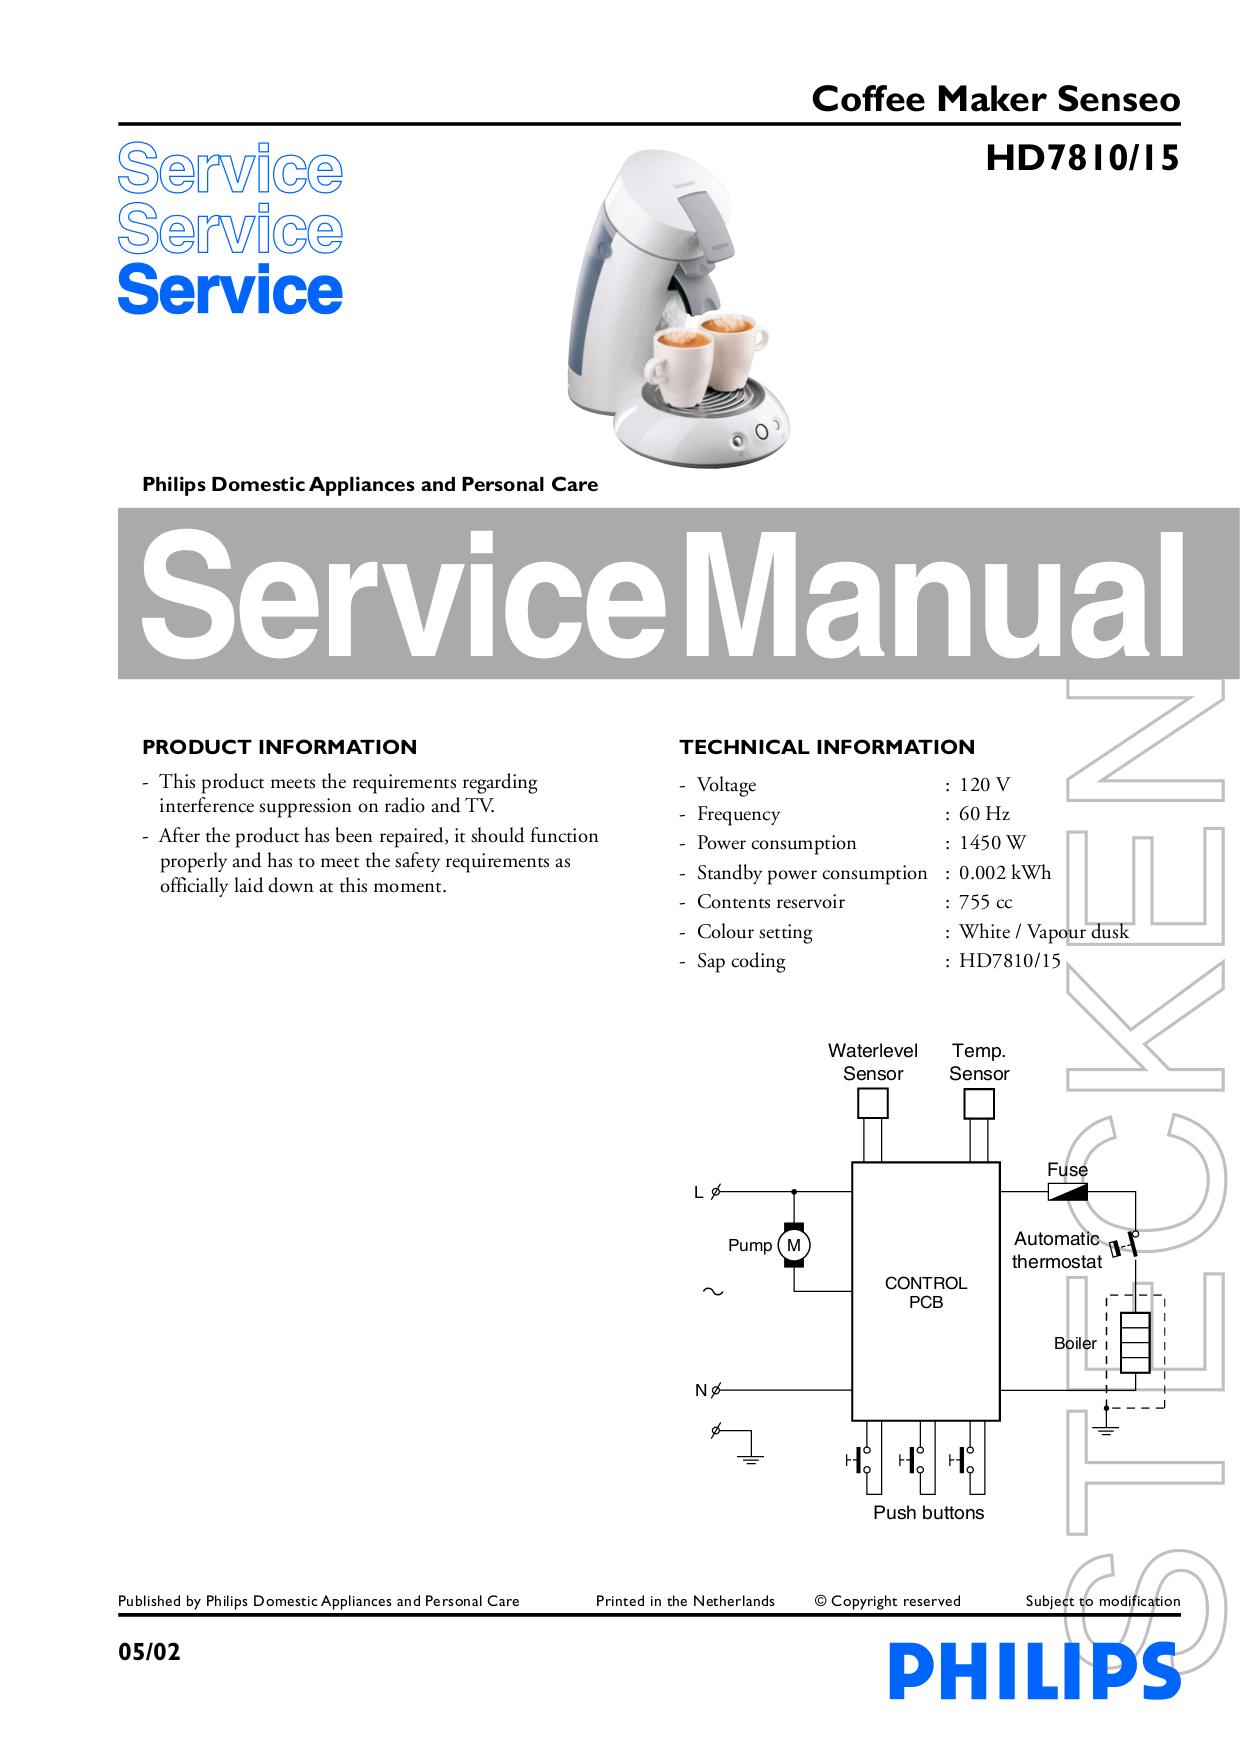 PDF manual for Philips Coffee Maker Senseo HD7810